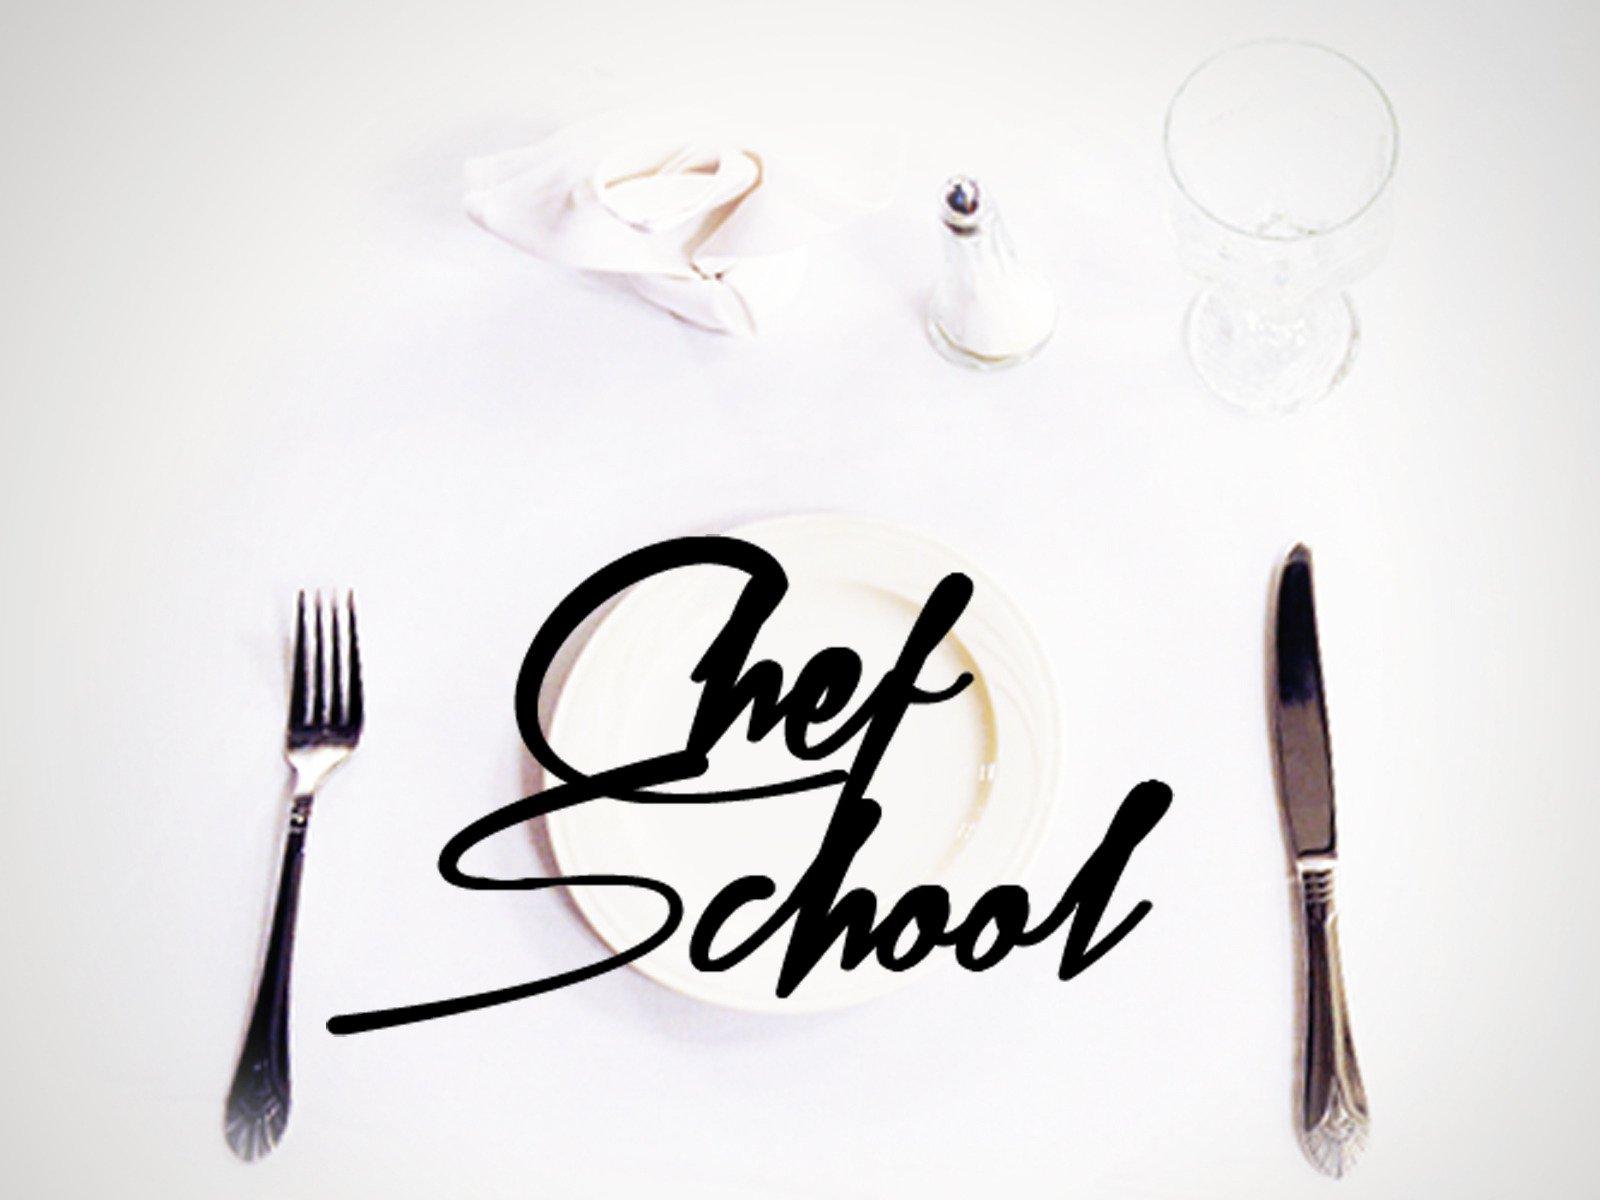 Amazon.com: Iron Chef America Season 3: Amazon Digital Services LLC